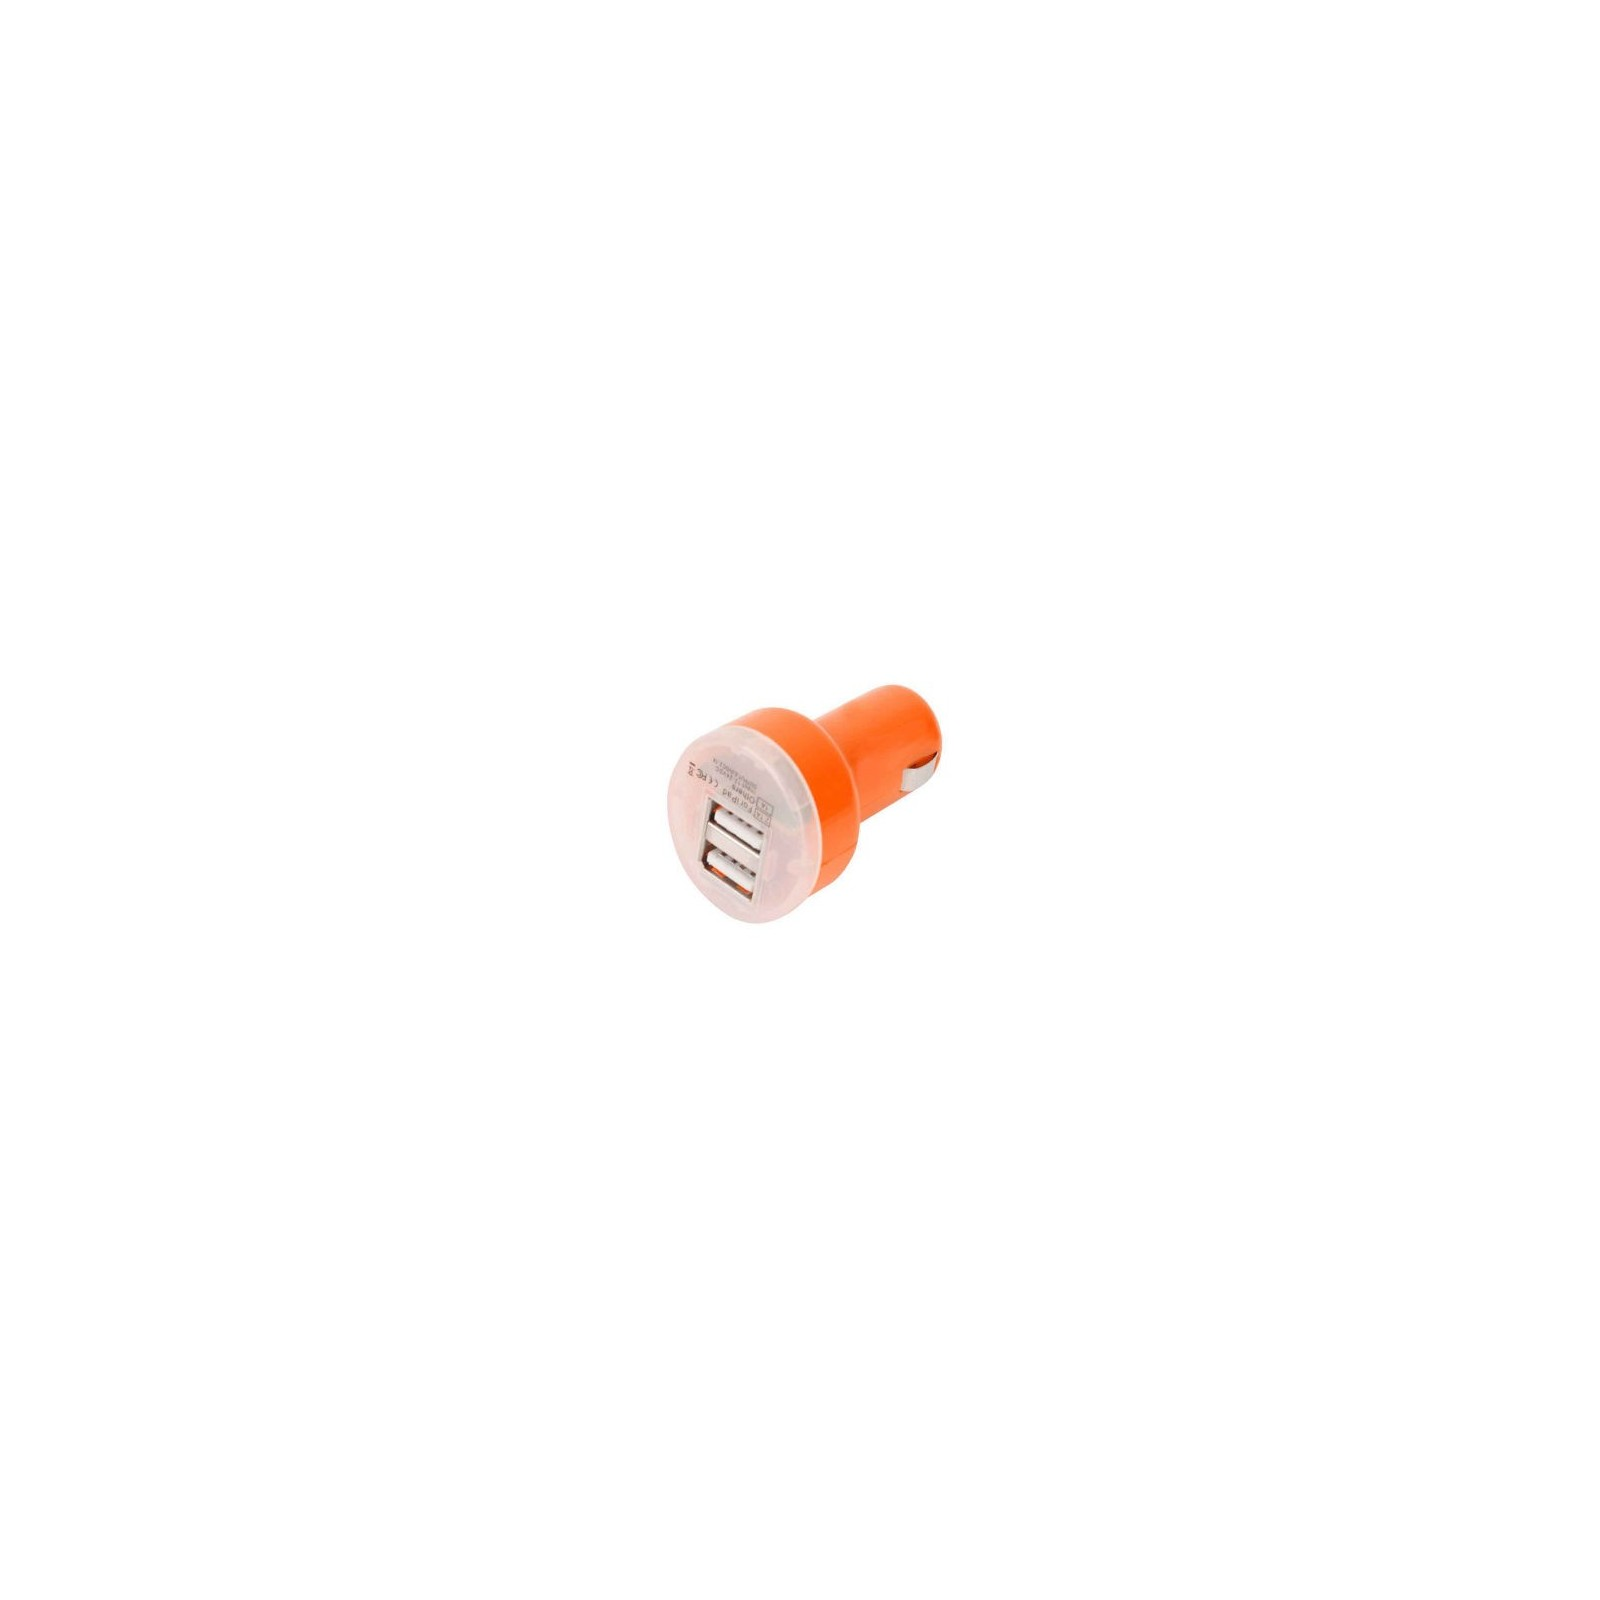 CARGADOR COCHE MOVIL RAPIDO DOBLE USB IPAD IPHONE SAMSUNG LG TABLET NARANJA ARREGLATELO - 1